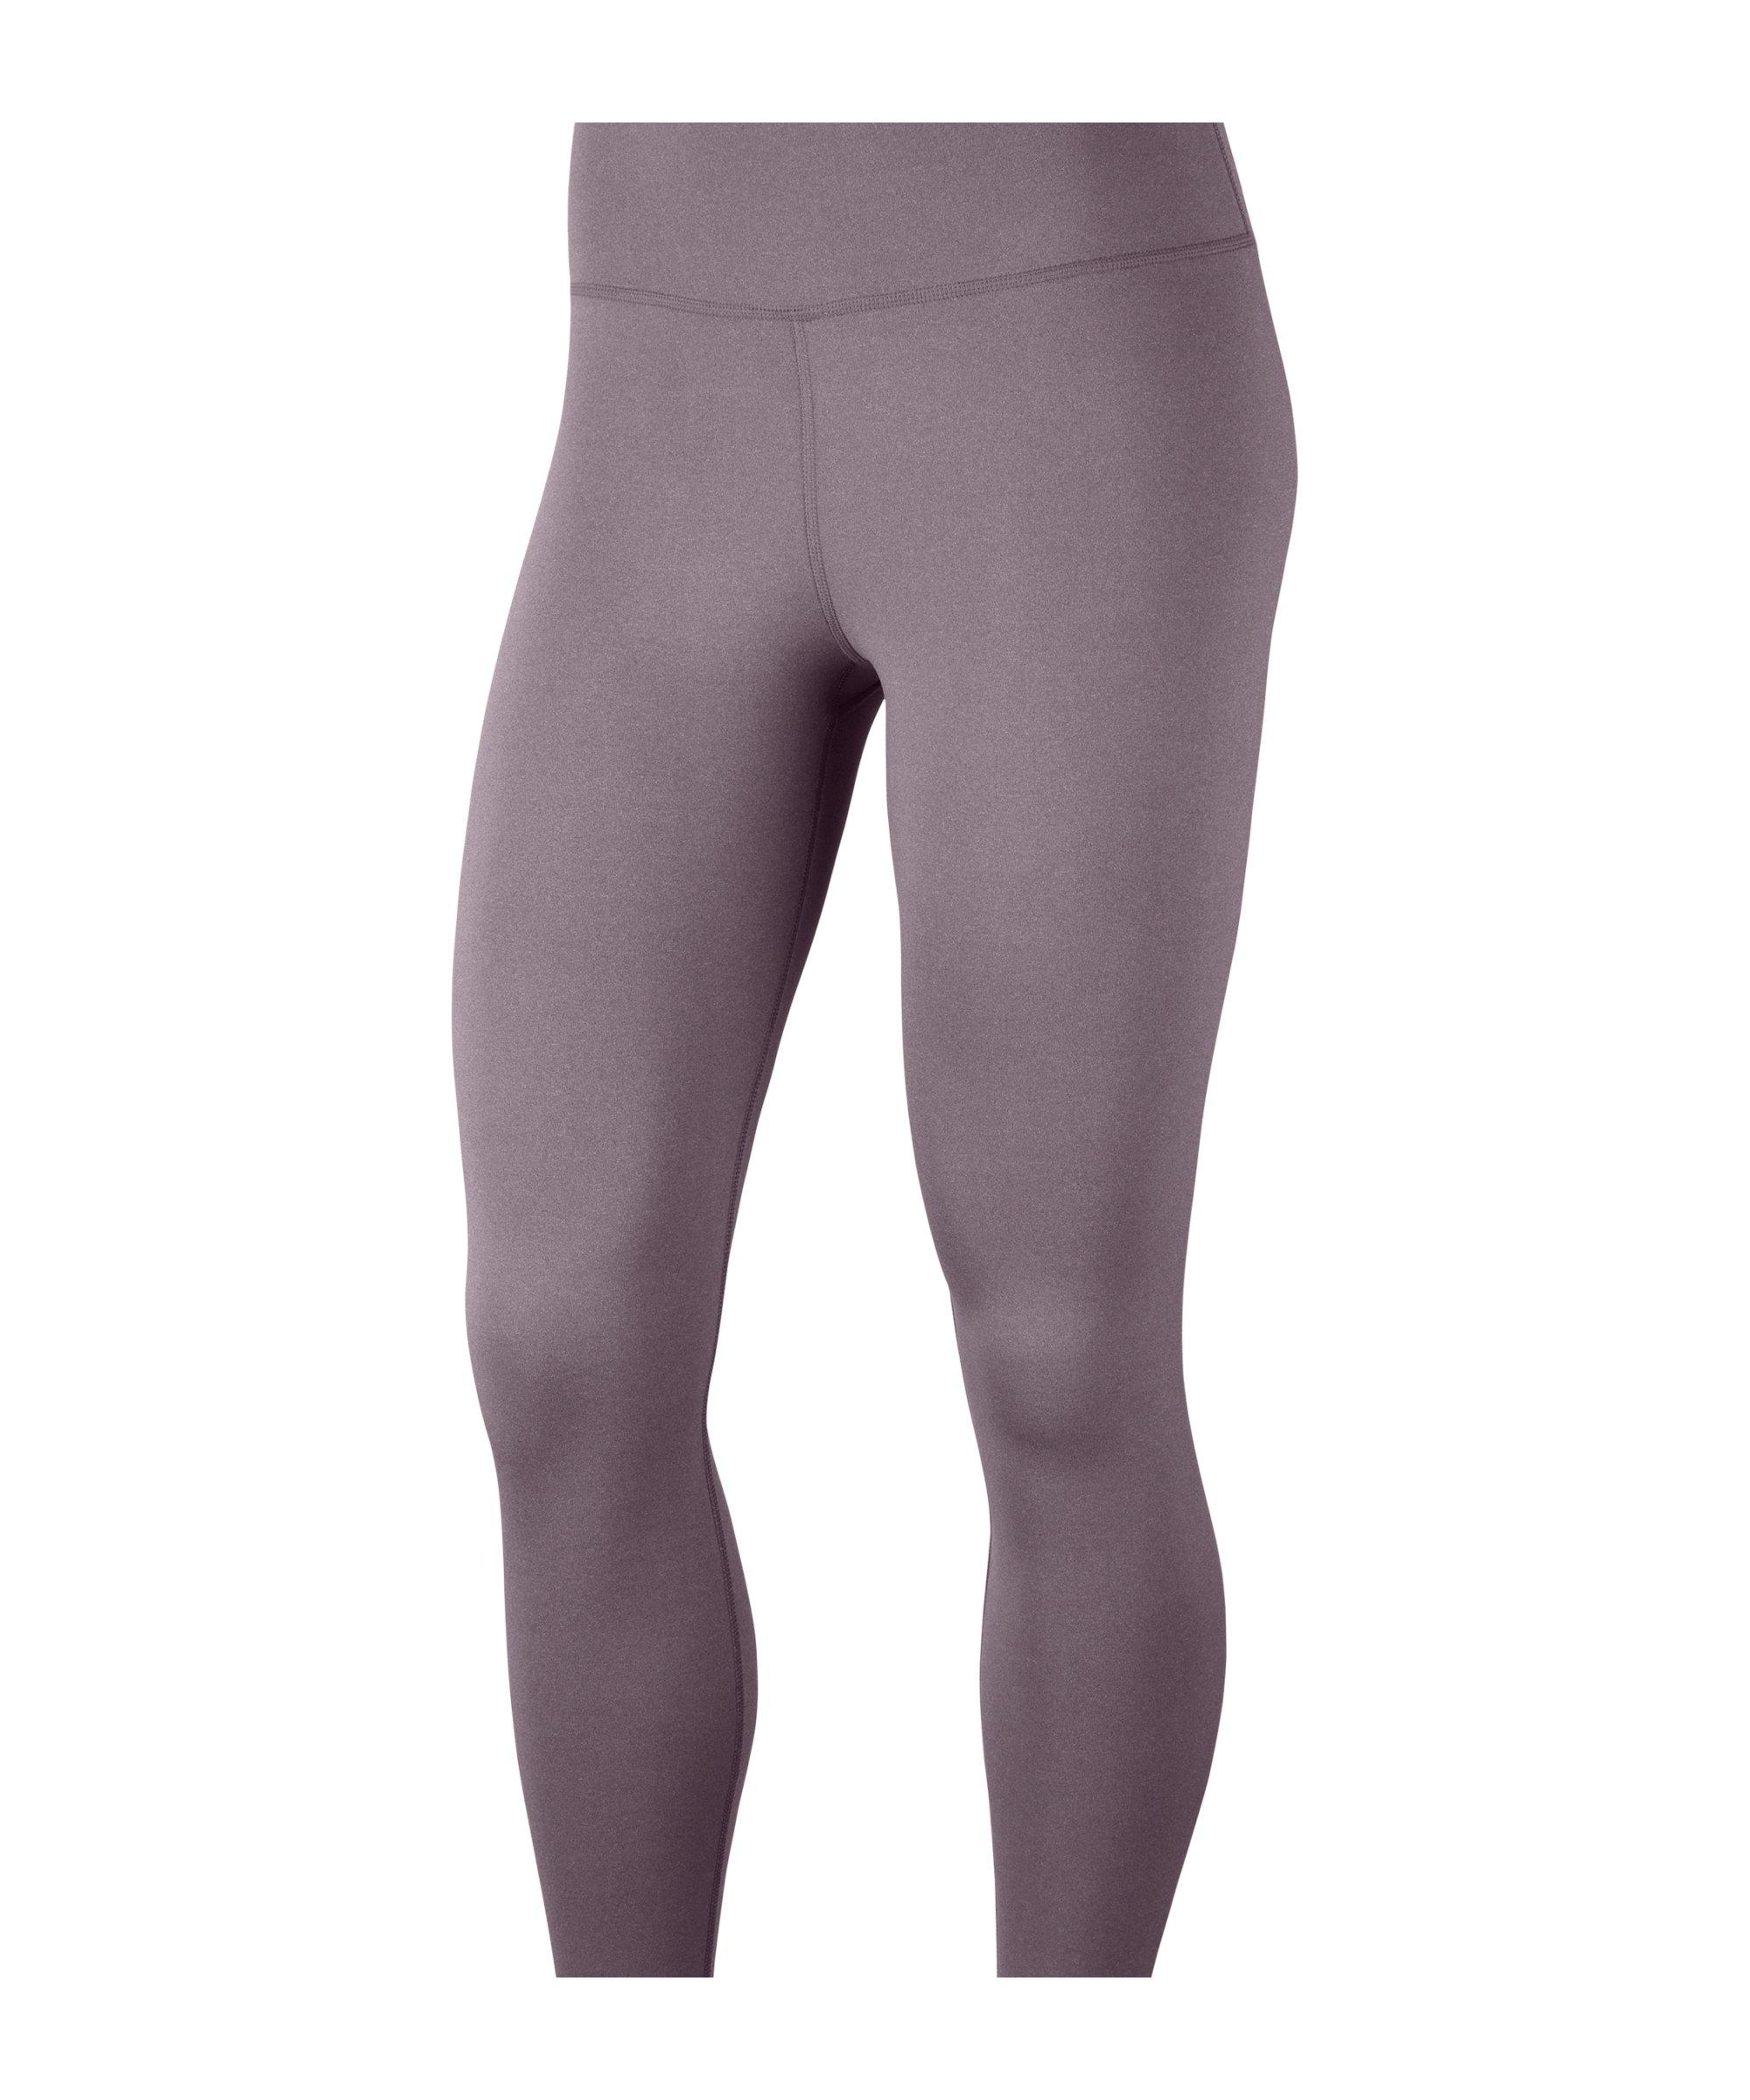 Nike Yoga 7/8 Leggings Training Damen Lila F531 - lila